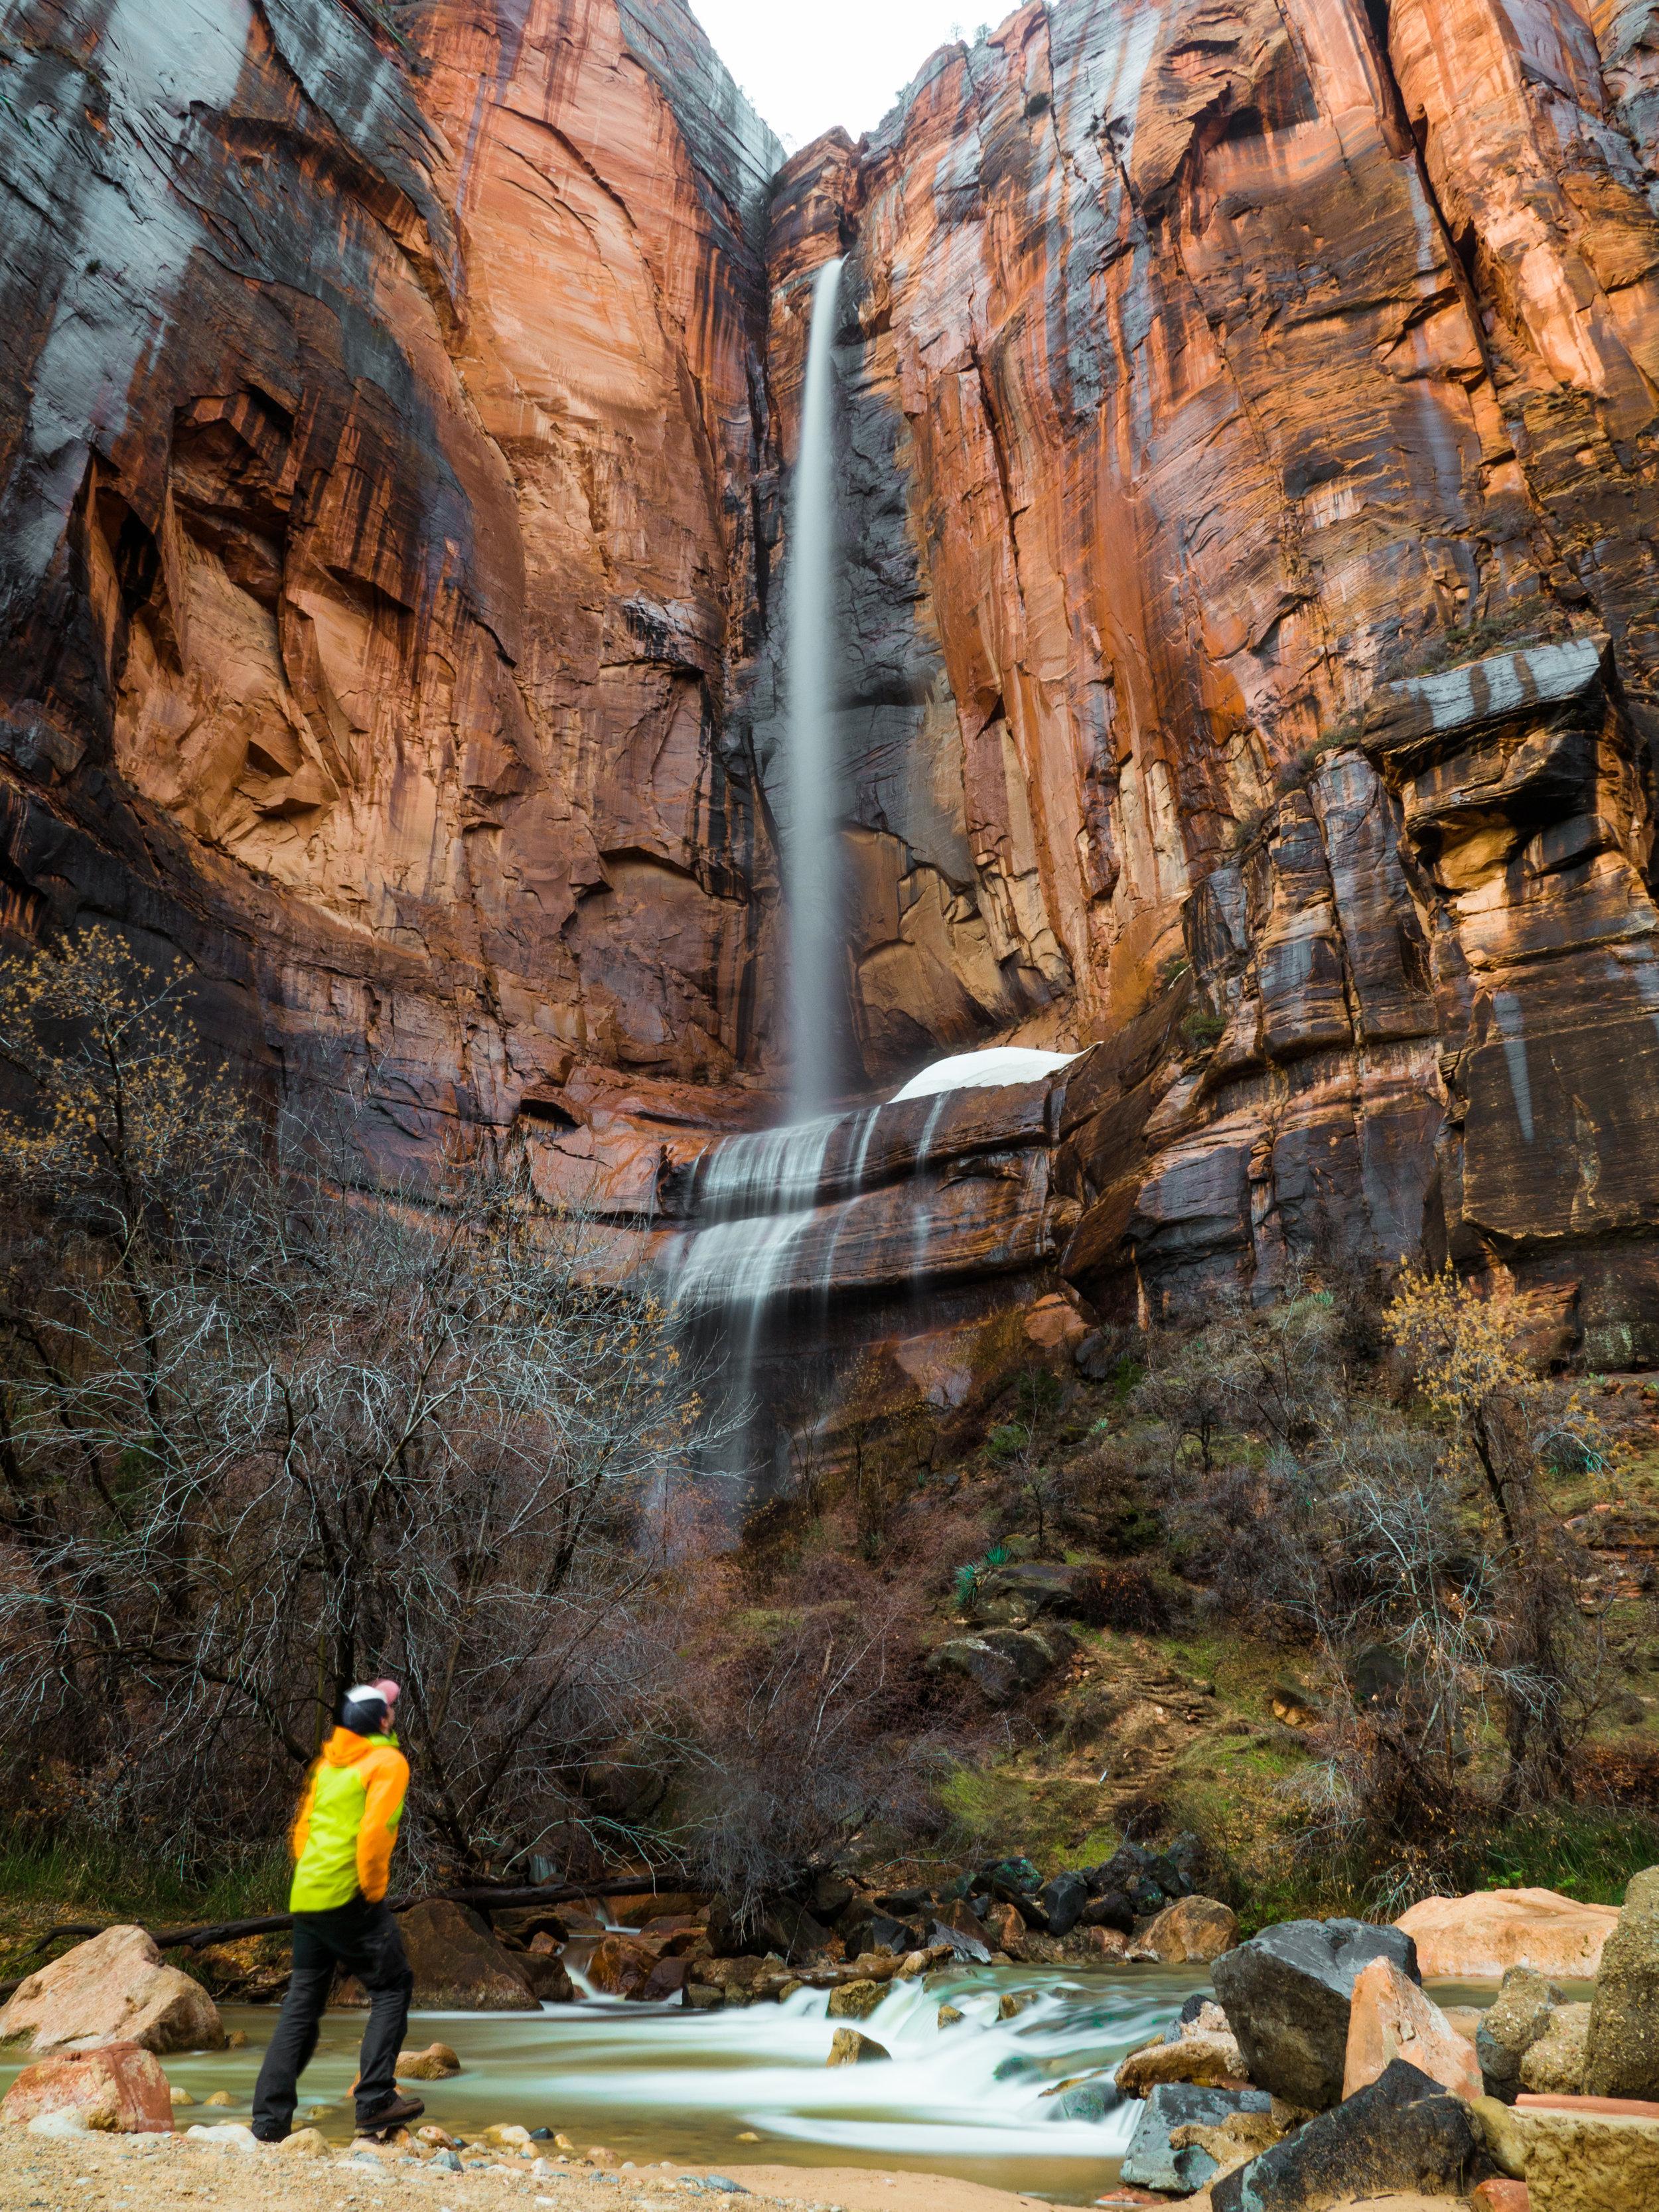 Waterfalls Popping